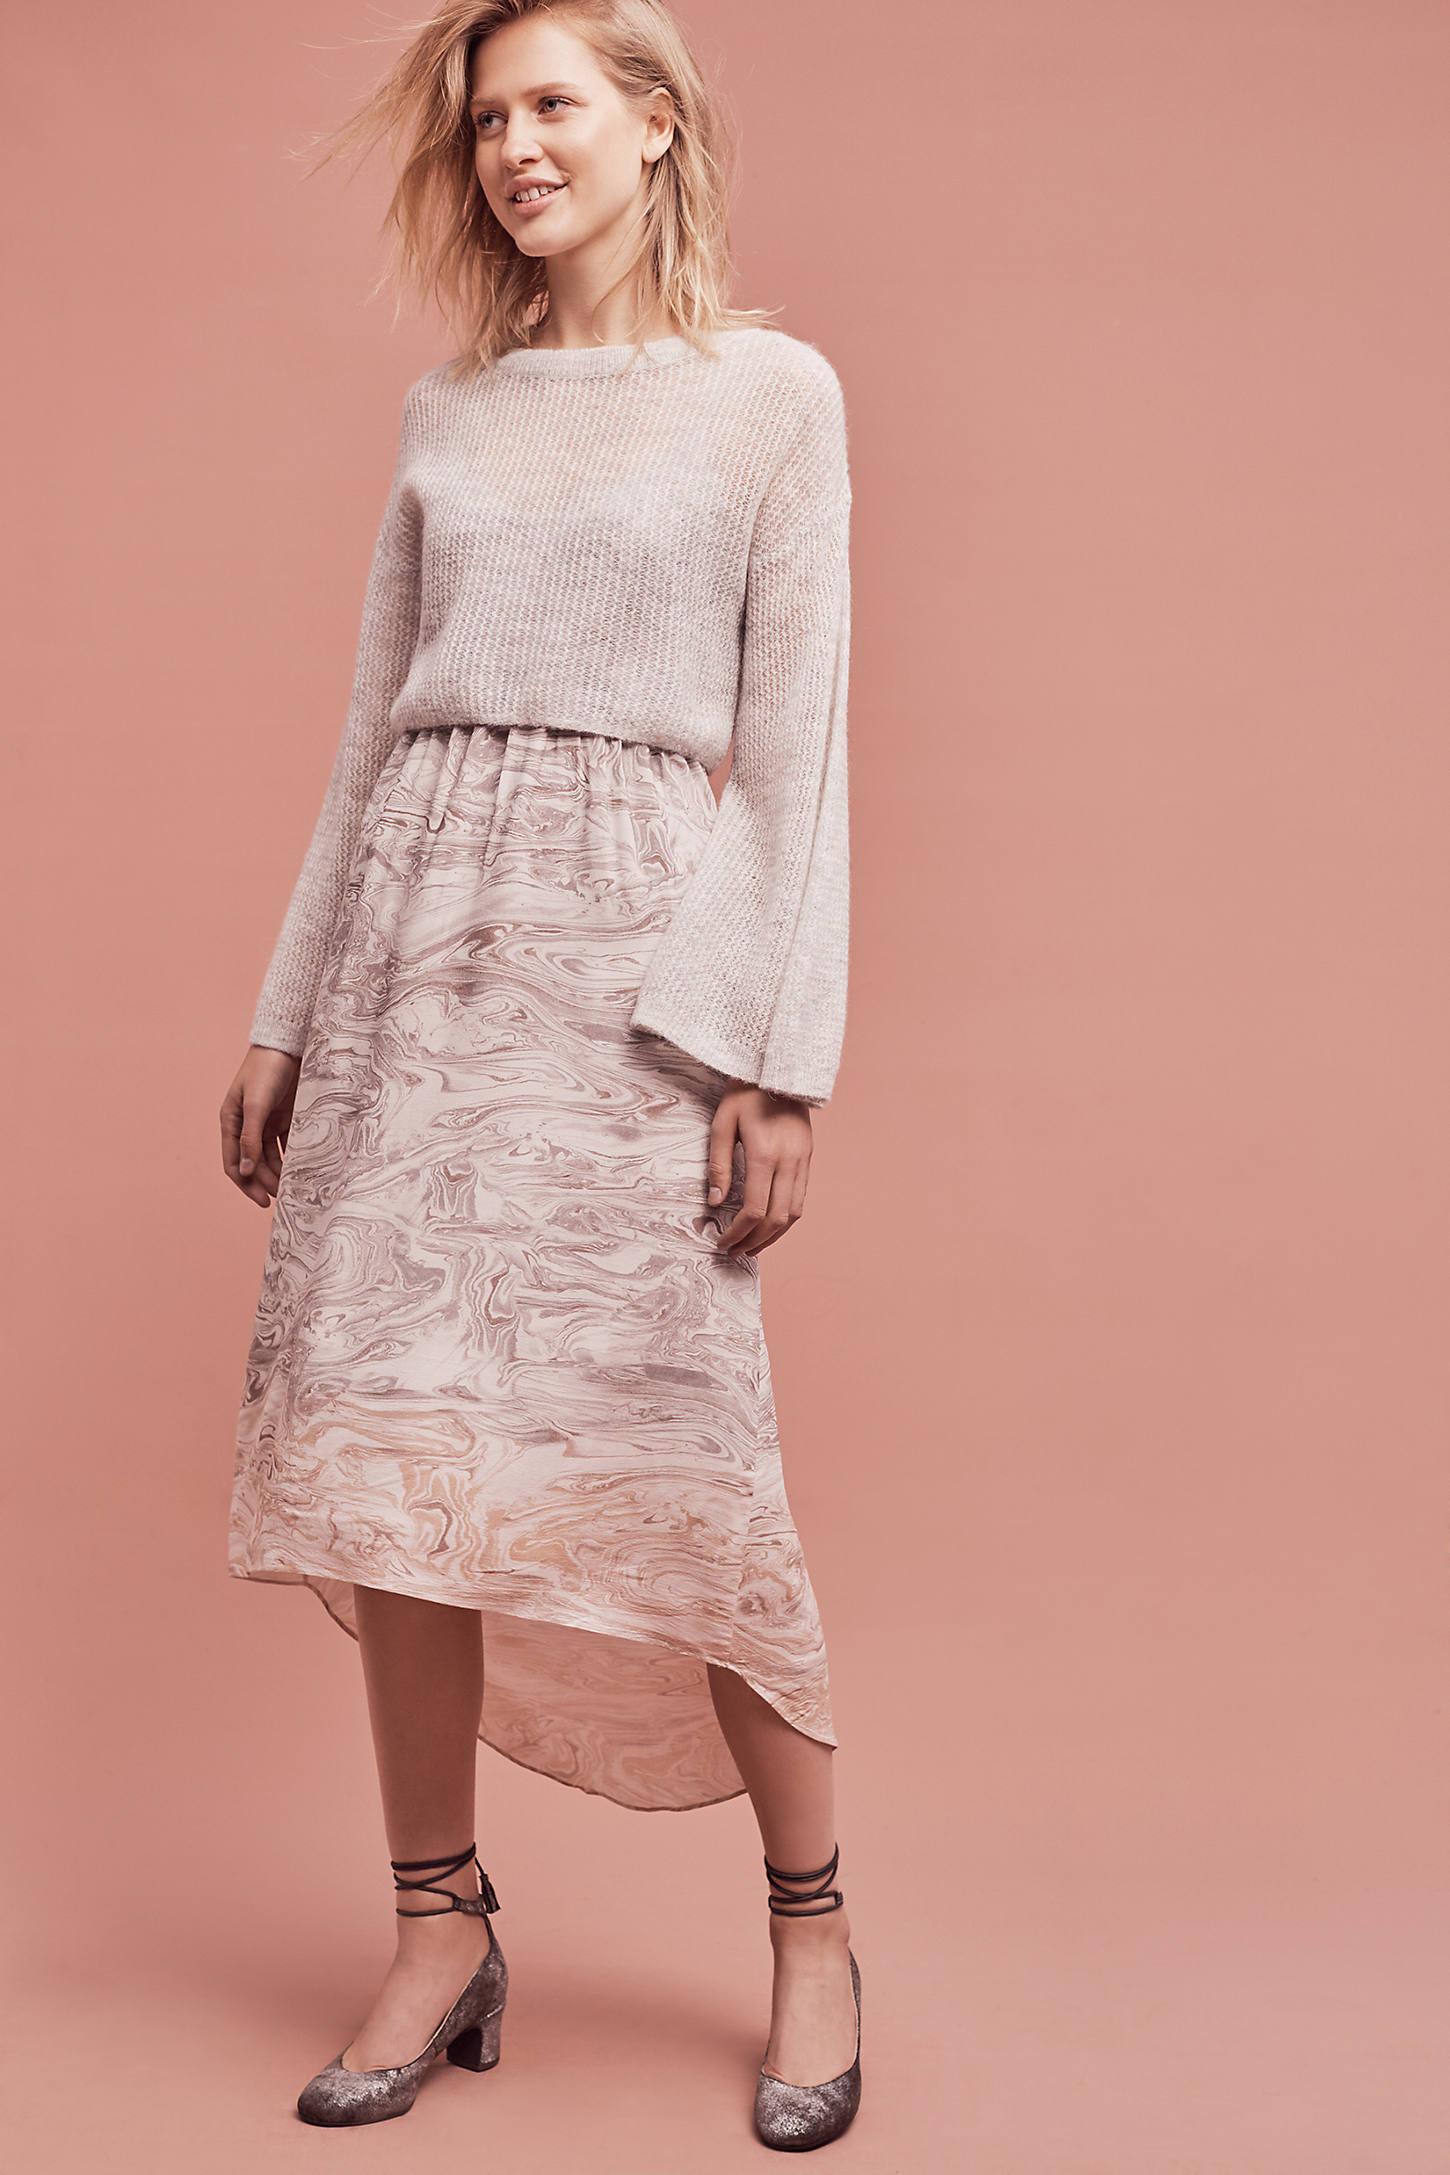 Rosay Sweater & Slipdress Set